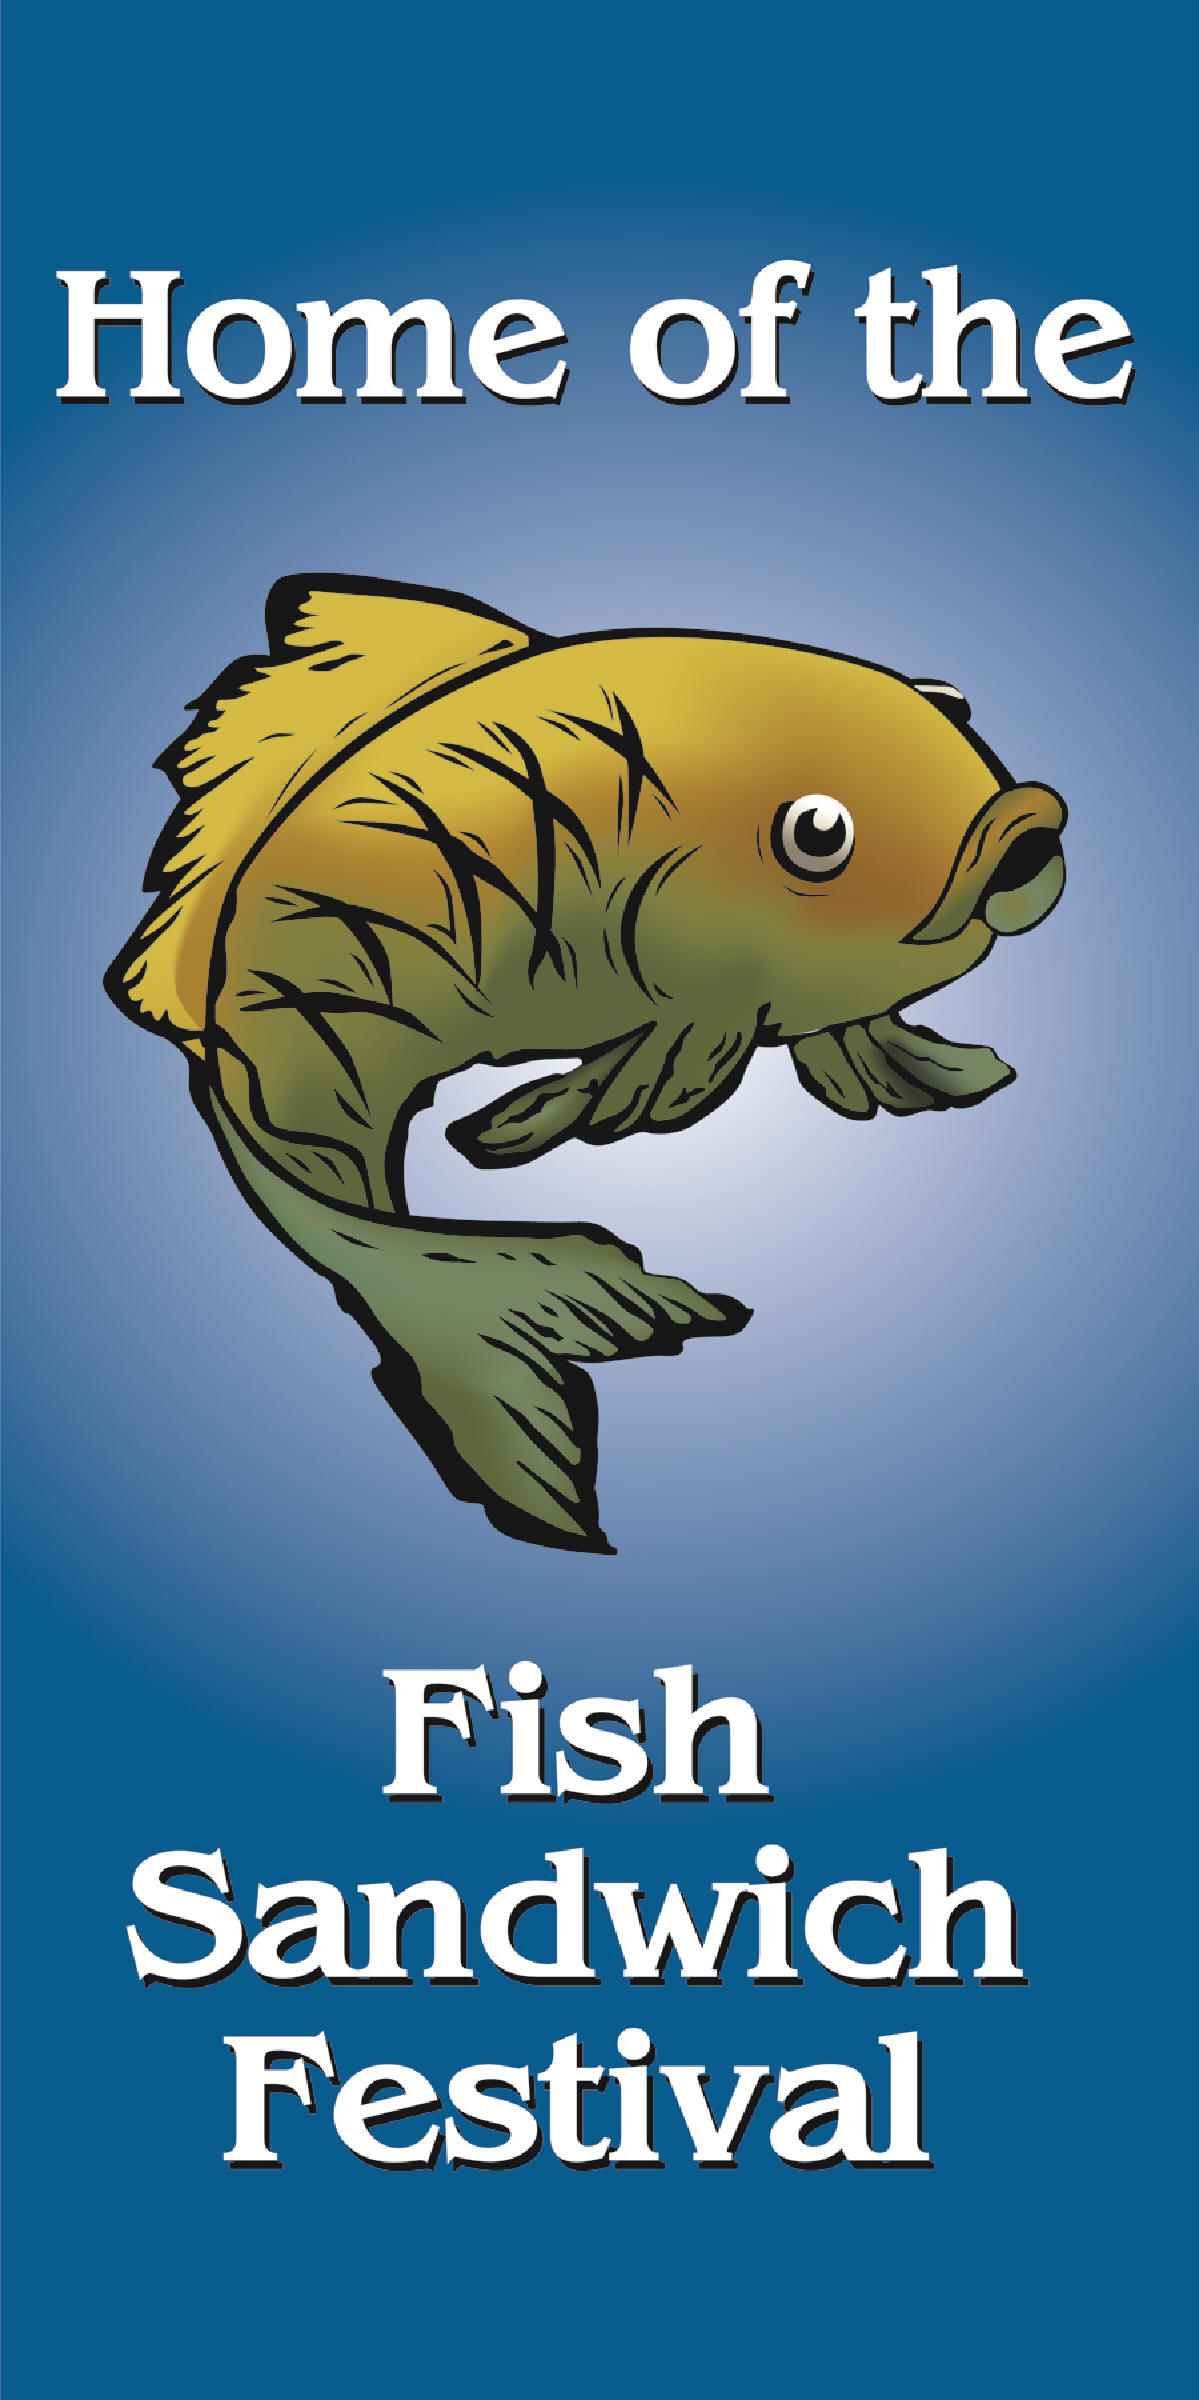 BayPort Fish Sandwich Festival Logo.jpg